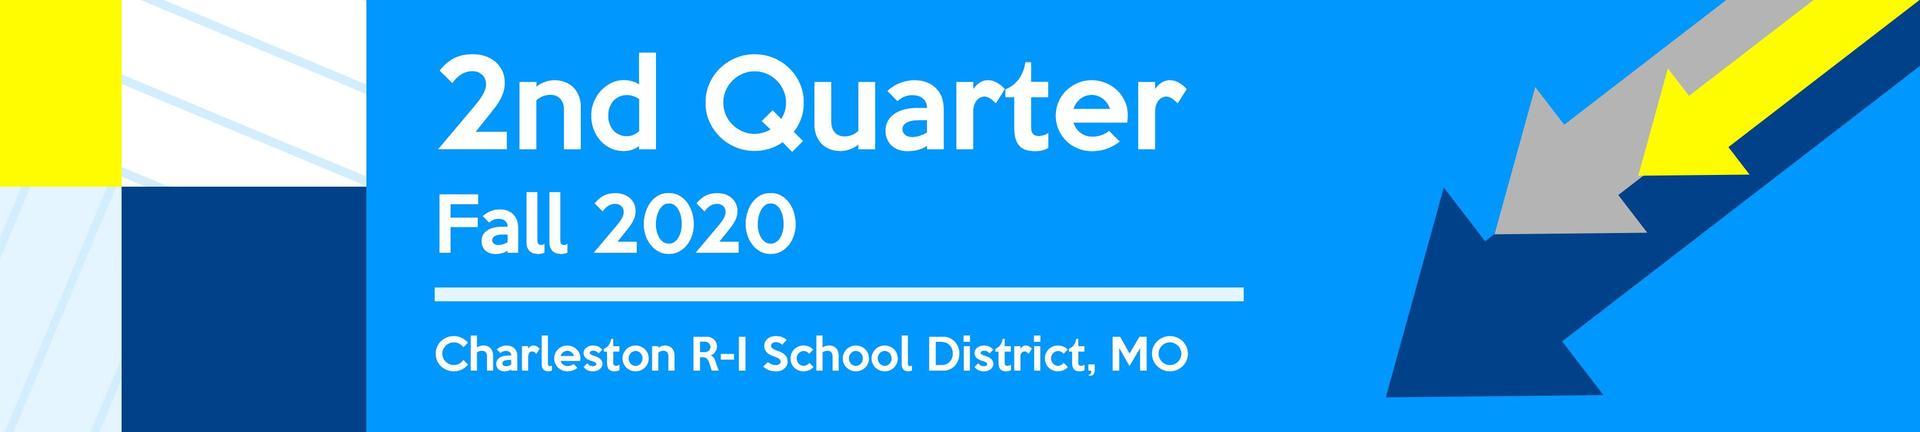 2nd Quarter Fall 2020 - Charleston R-I School District, MO